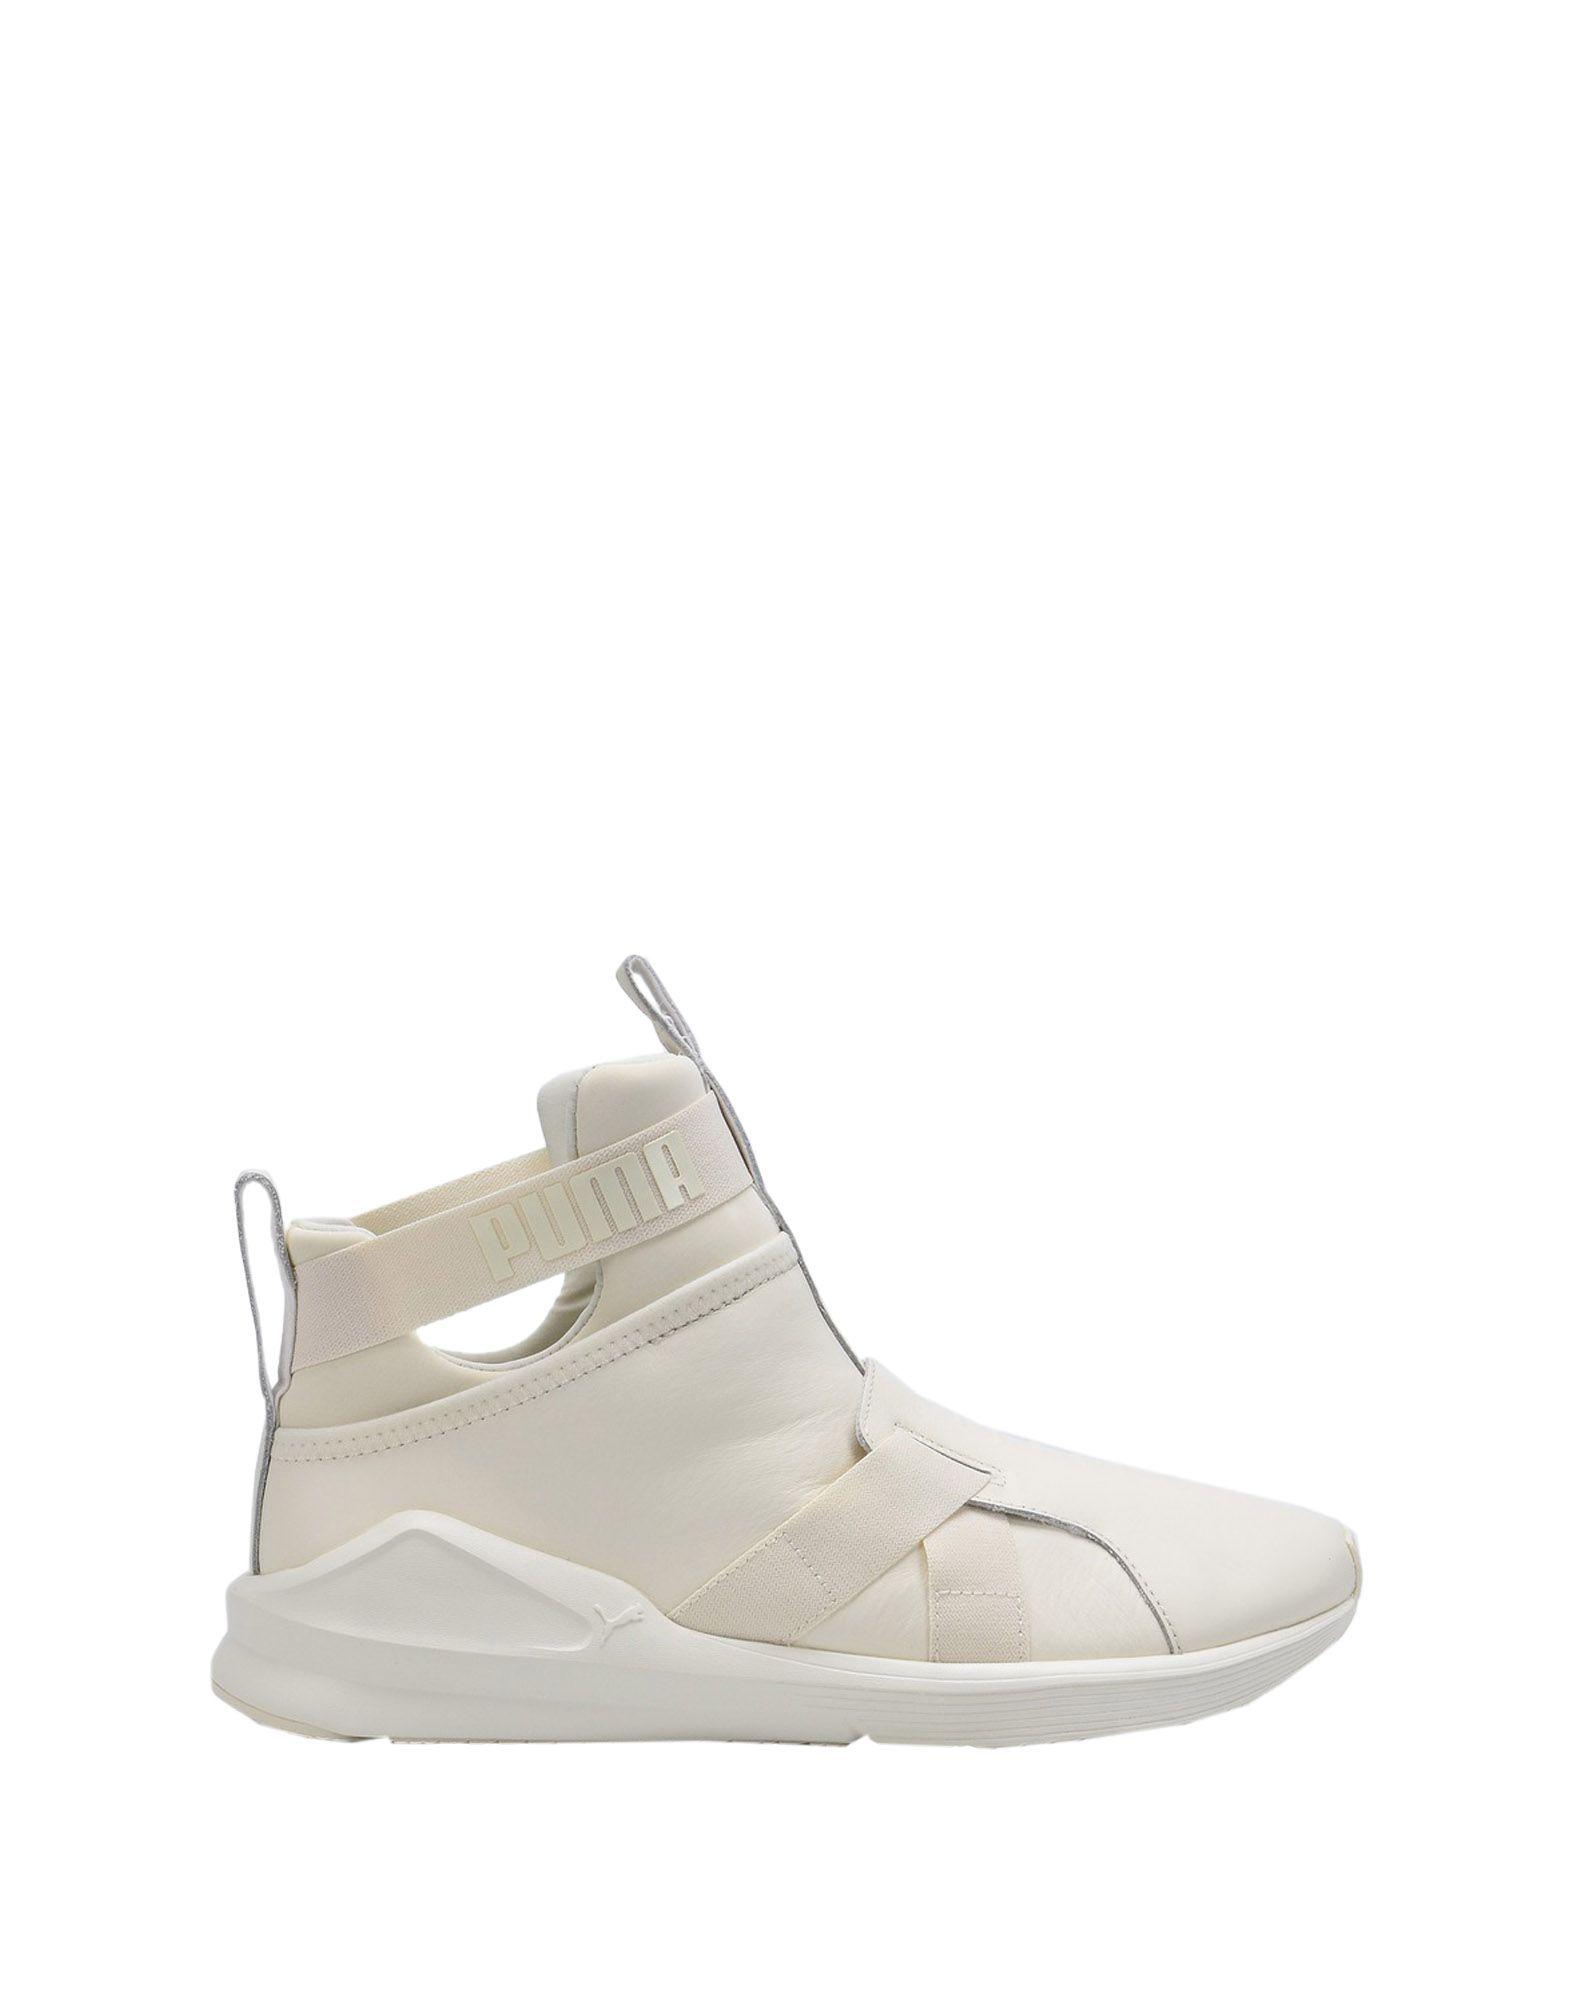 Sneakers Puma Fierce Strap Leather Wns - Femme - Sneakers Puma sur